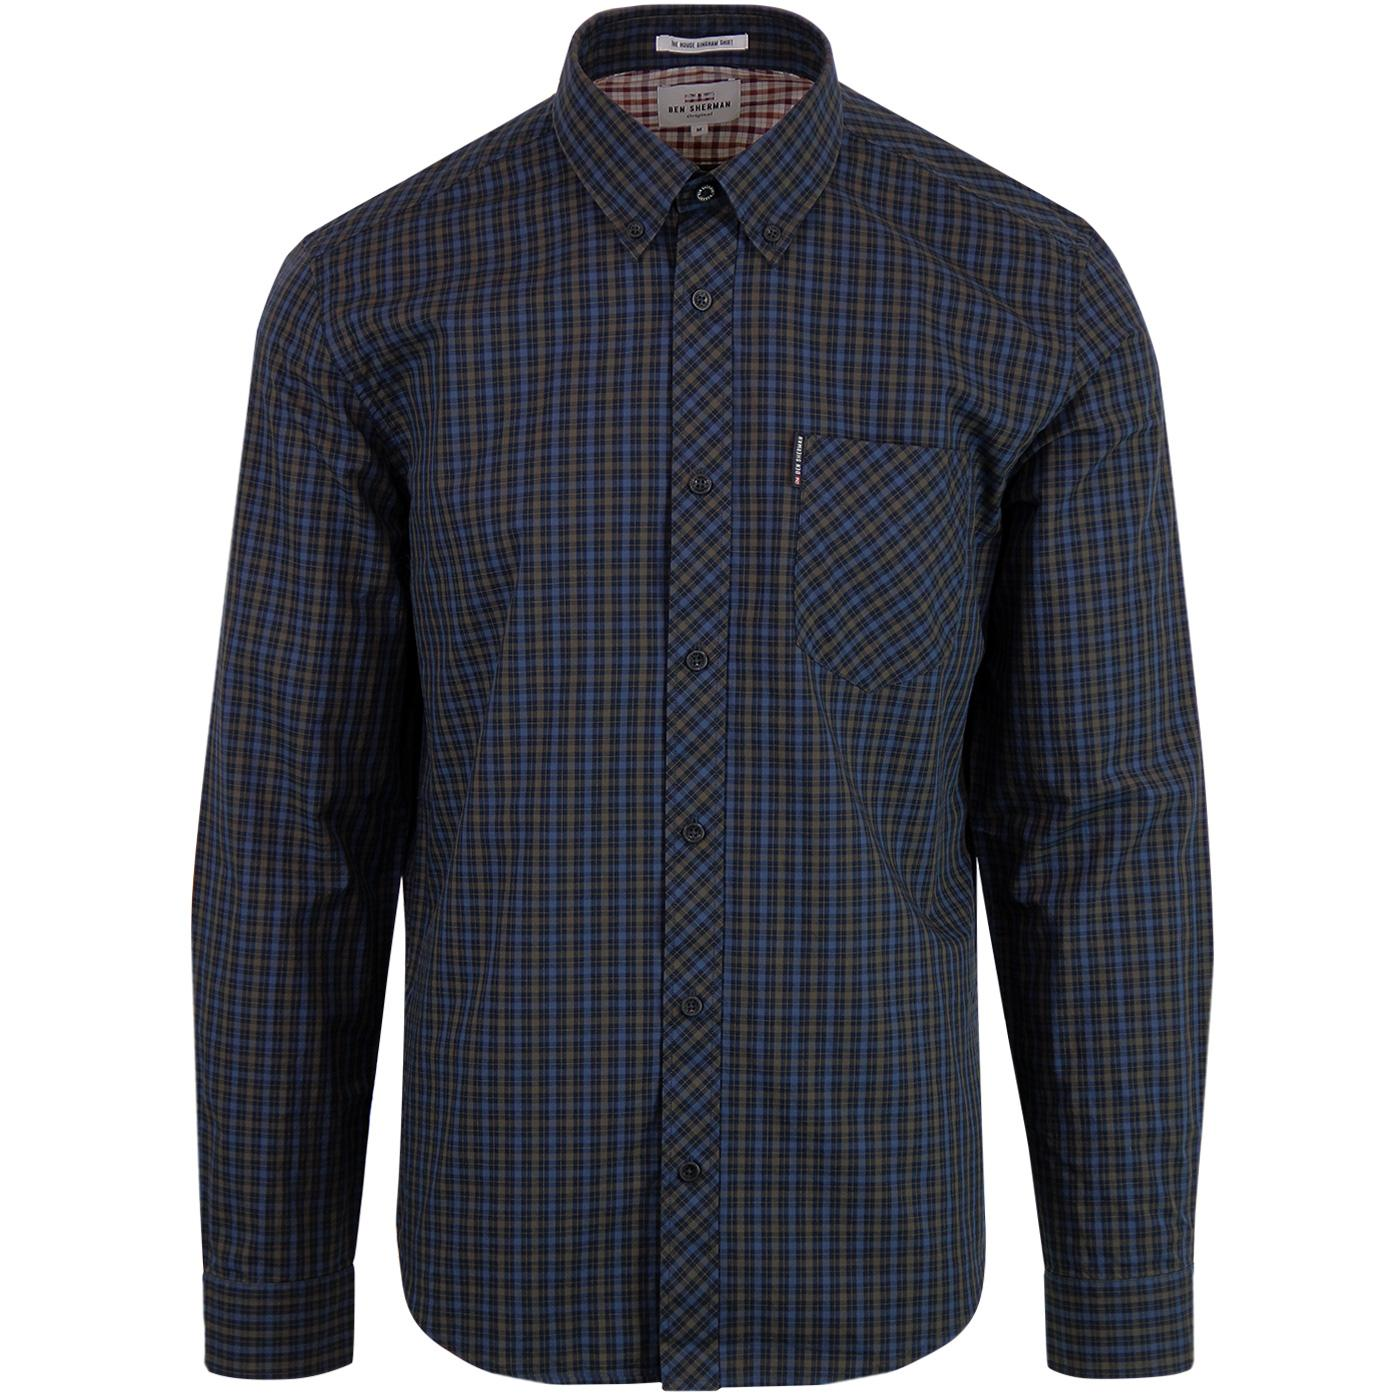 BEN SHERMAN Men's Retro Mod House Check Shirt BARK